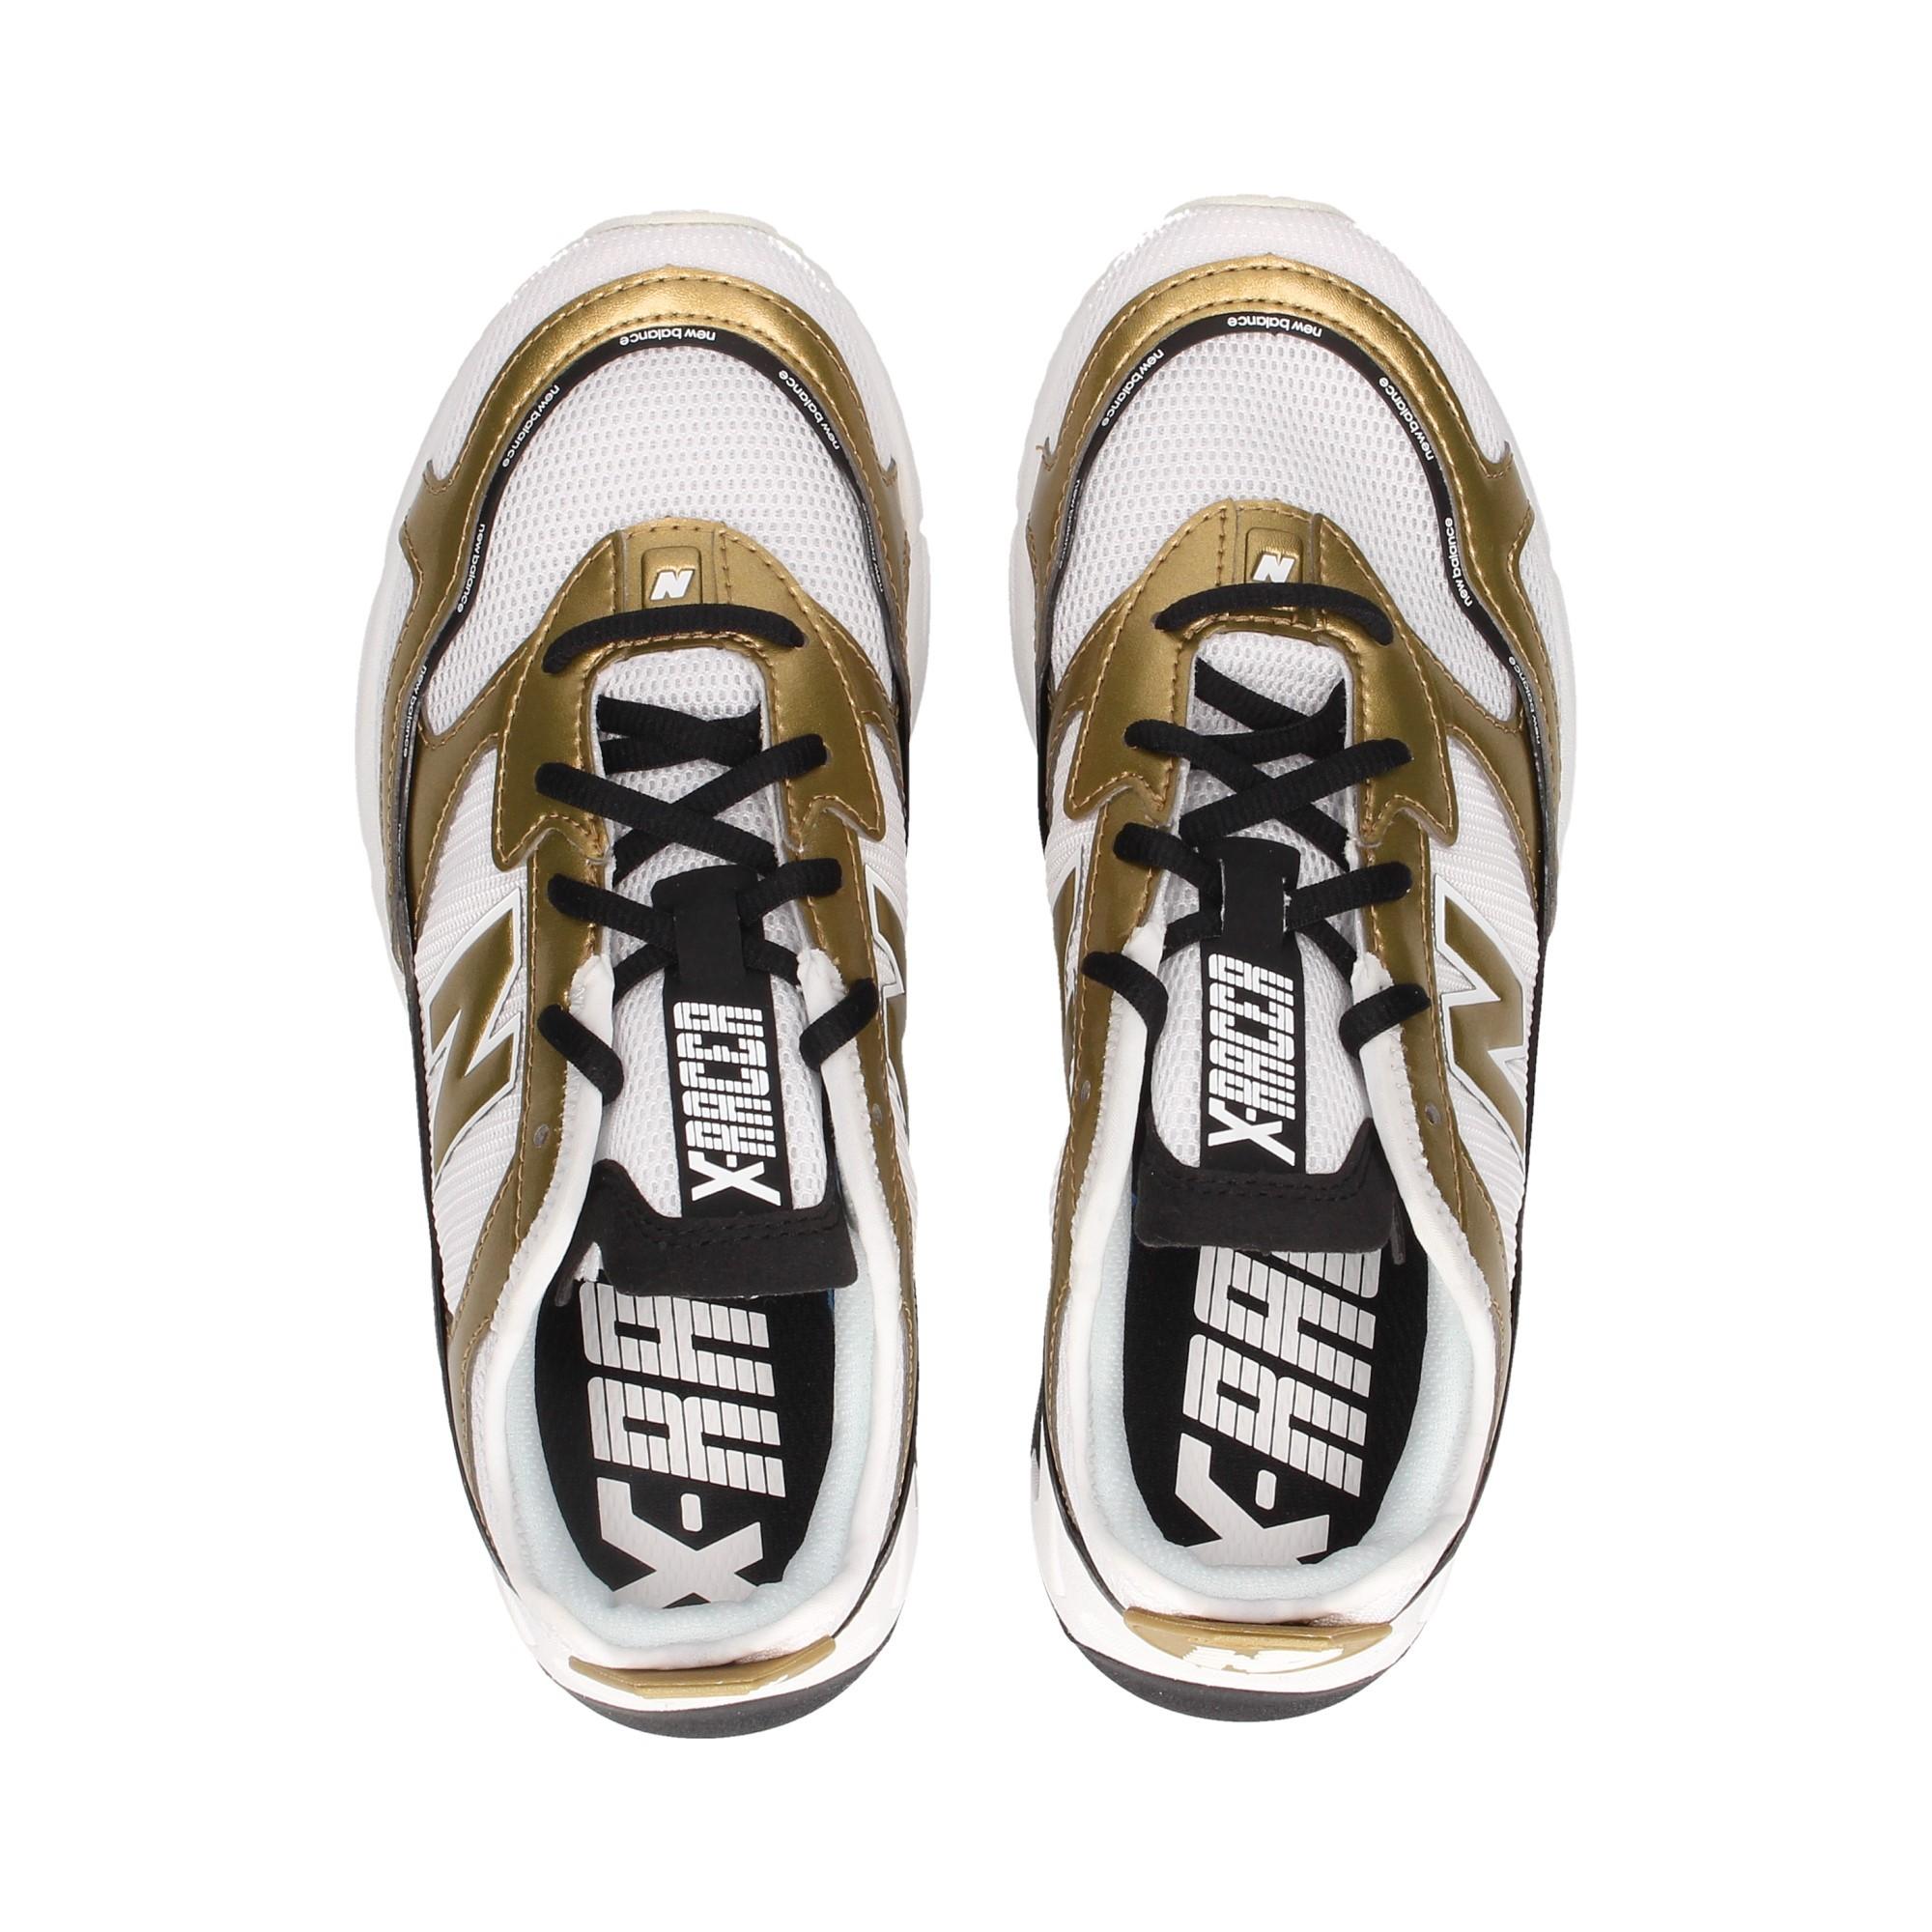 NEW BALANCE Chaussures de sport pour femmes XRC HLD